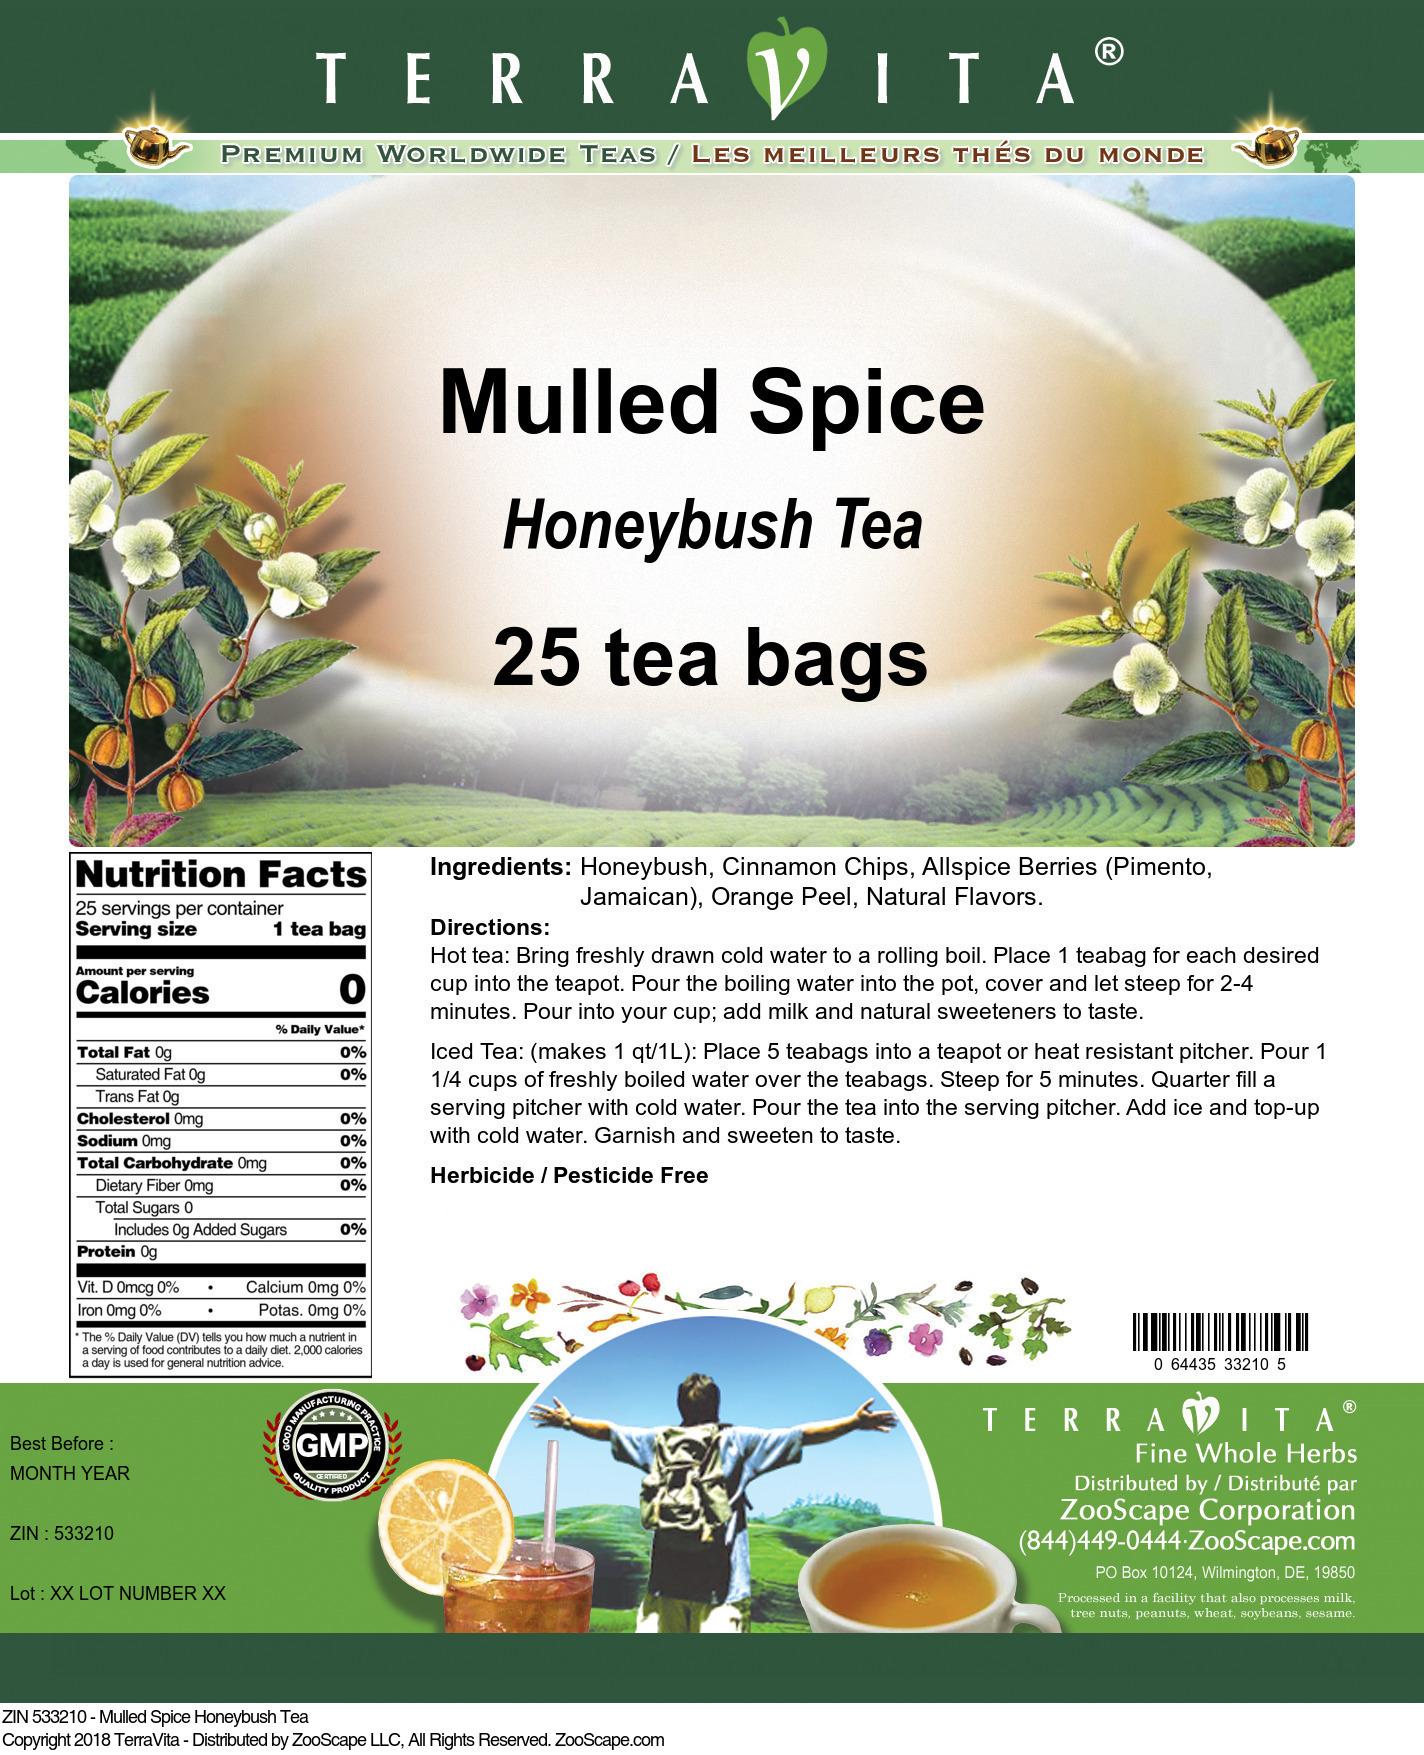 Mulled Spice Honeybush Tea